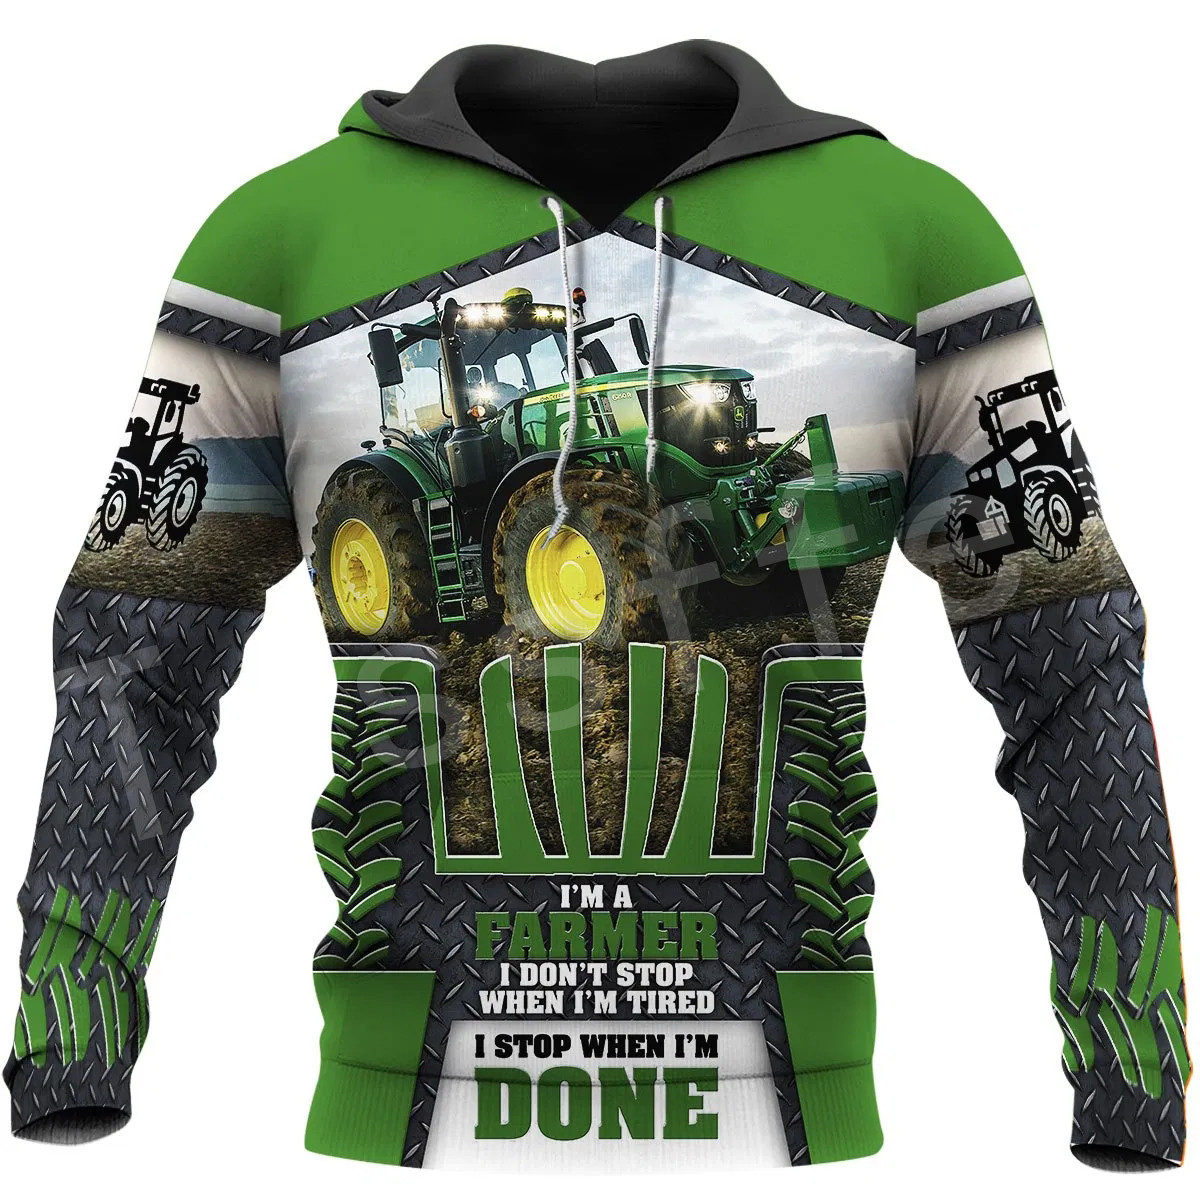 Tessffel Worker Farmer Tractor Instrument Funny NewFashion Long Sleeves 3DPrint Zipper/Hoodies/Sweatshirts/Jacket/Men/women A-11